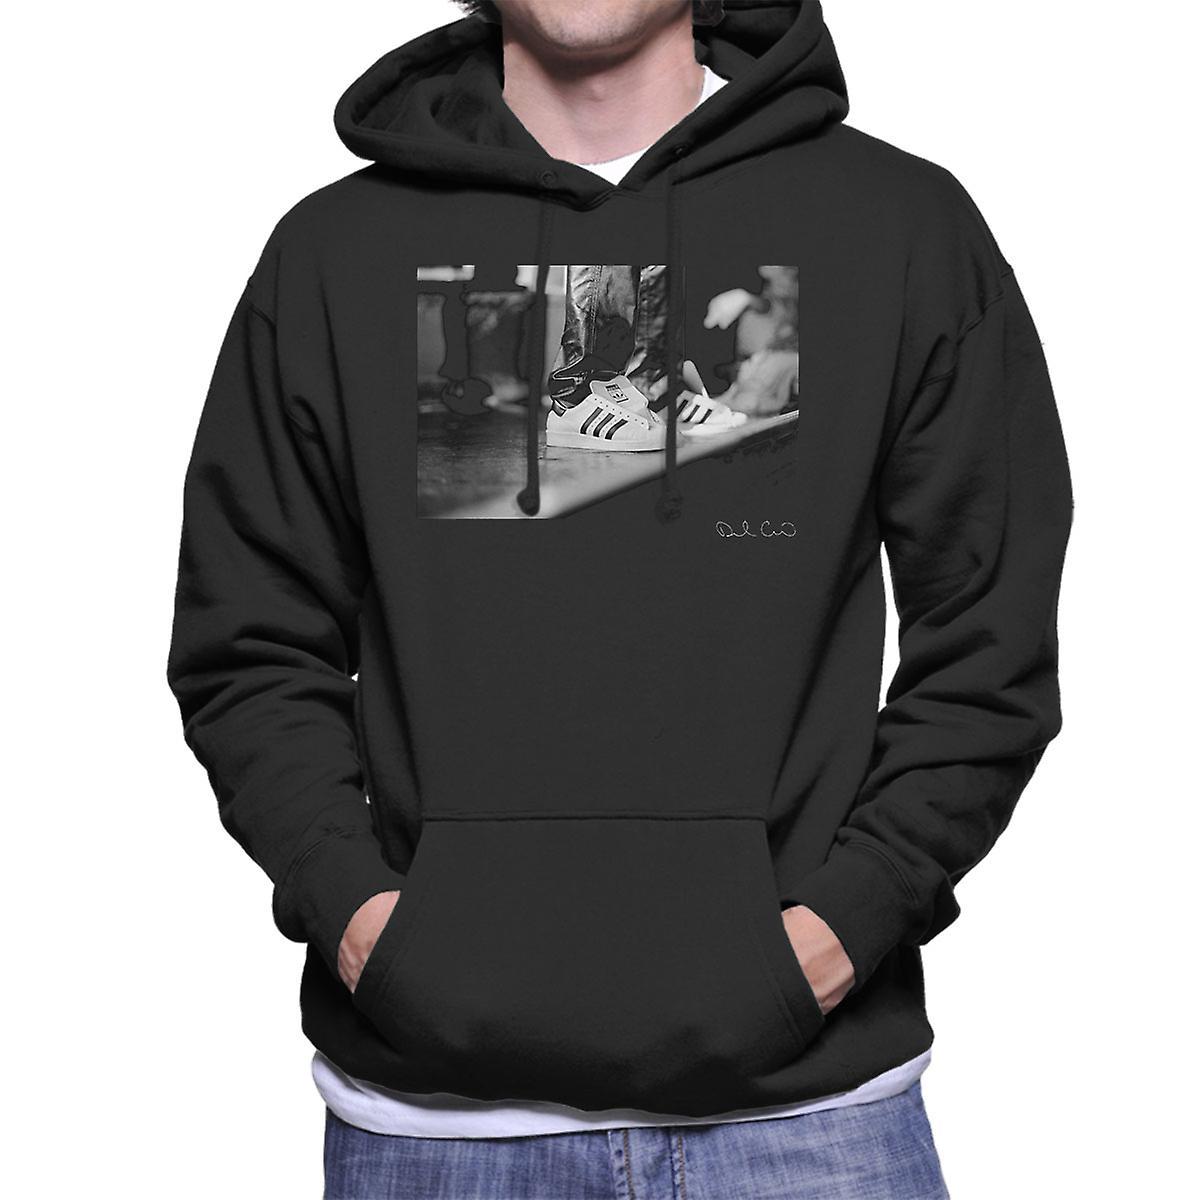 Run DMC Adidas Originals Trainers Hammersmith 1986 Men's T Shirt